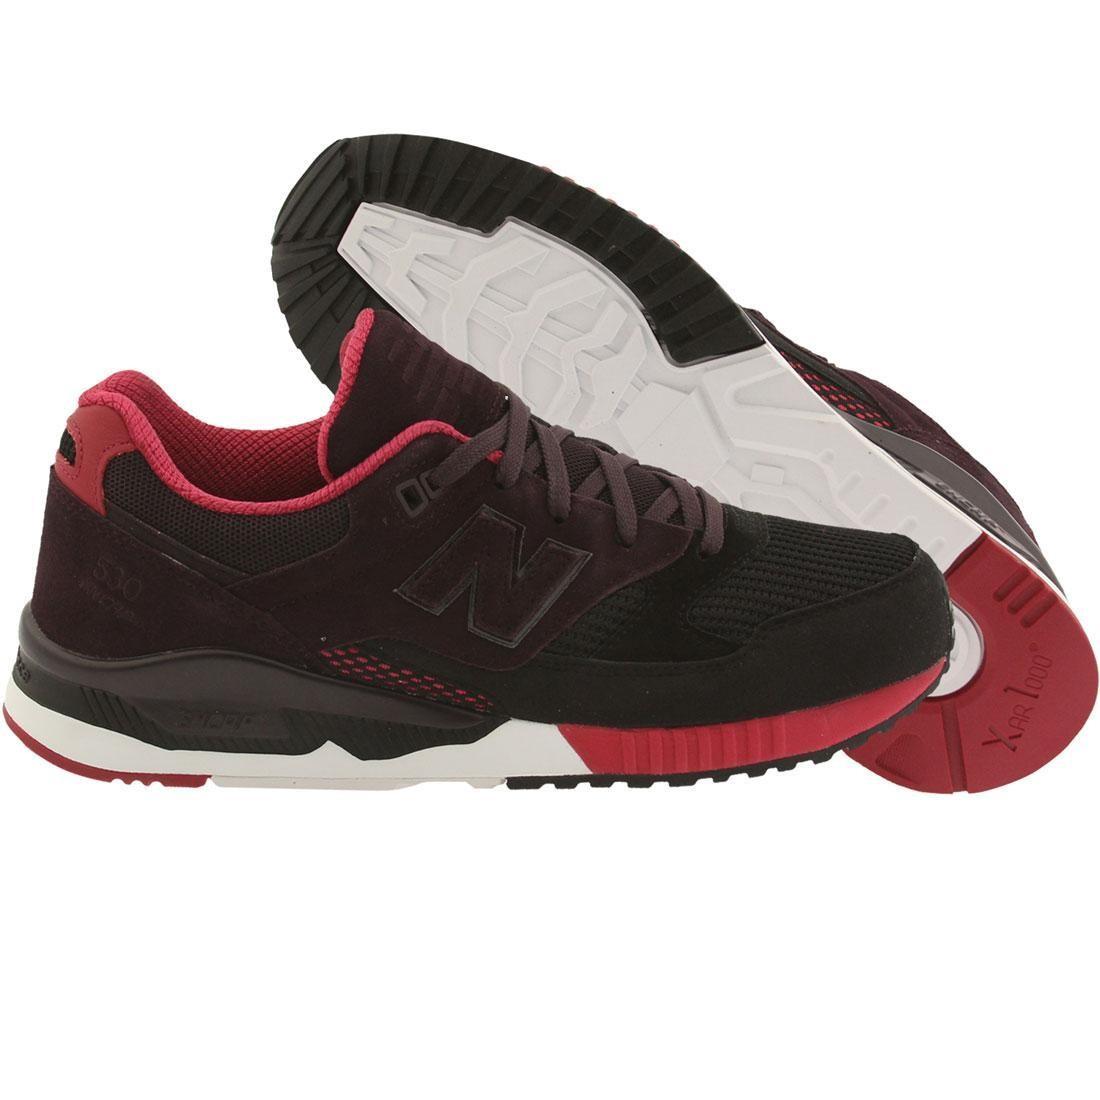 taille 40 0b765 15d59 New Balance Men 530 Bionic Boom M530RTA (black / blackberry / red)